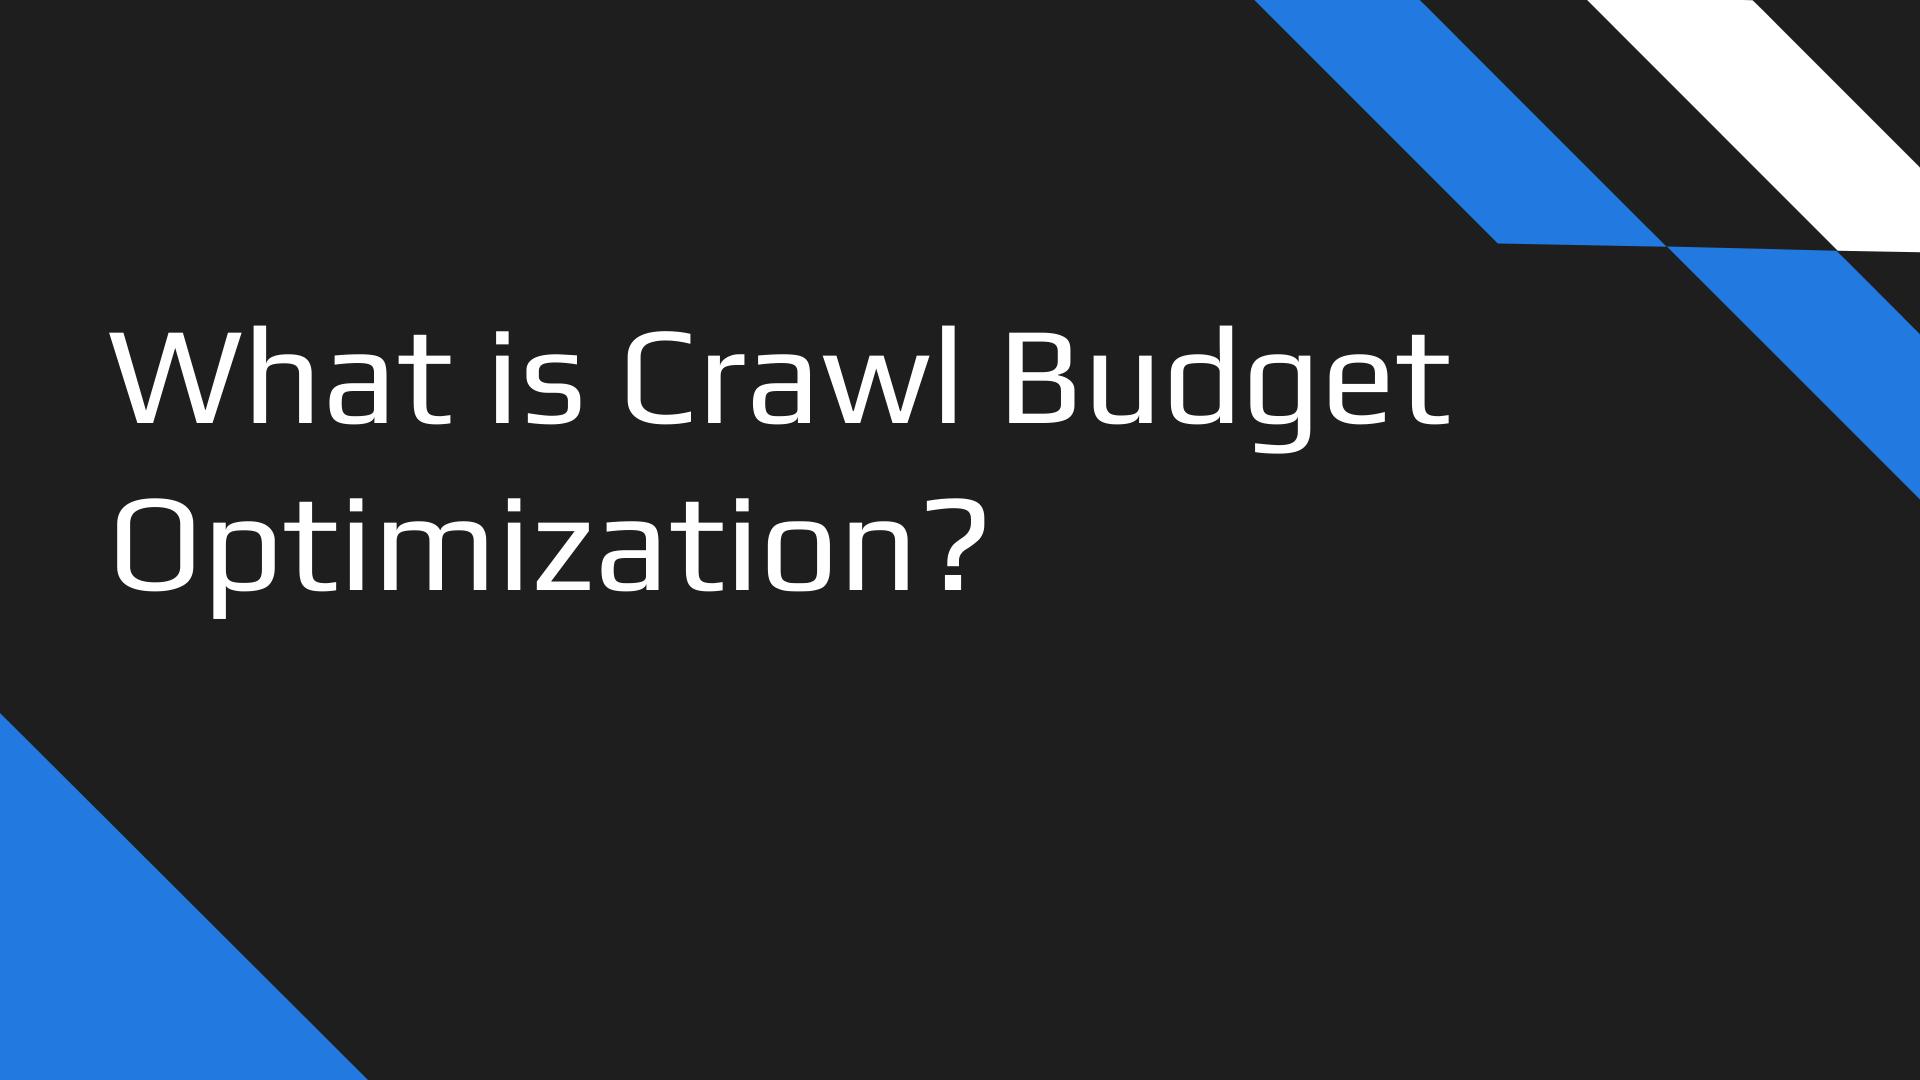 What is Crawl Budget Optimization?